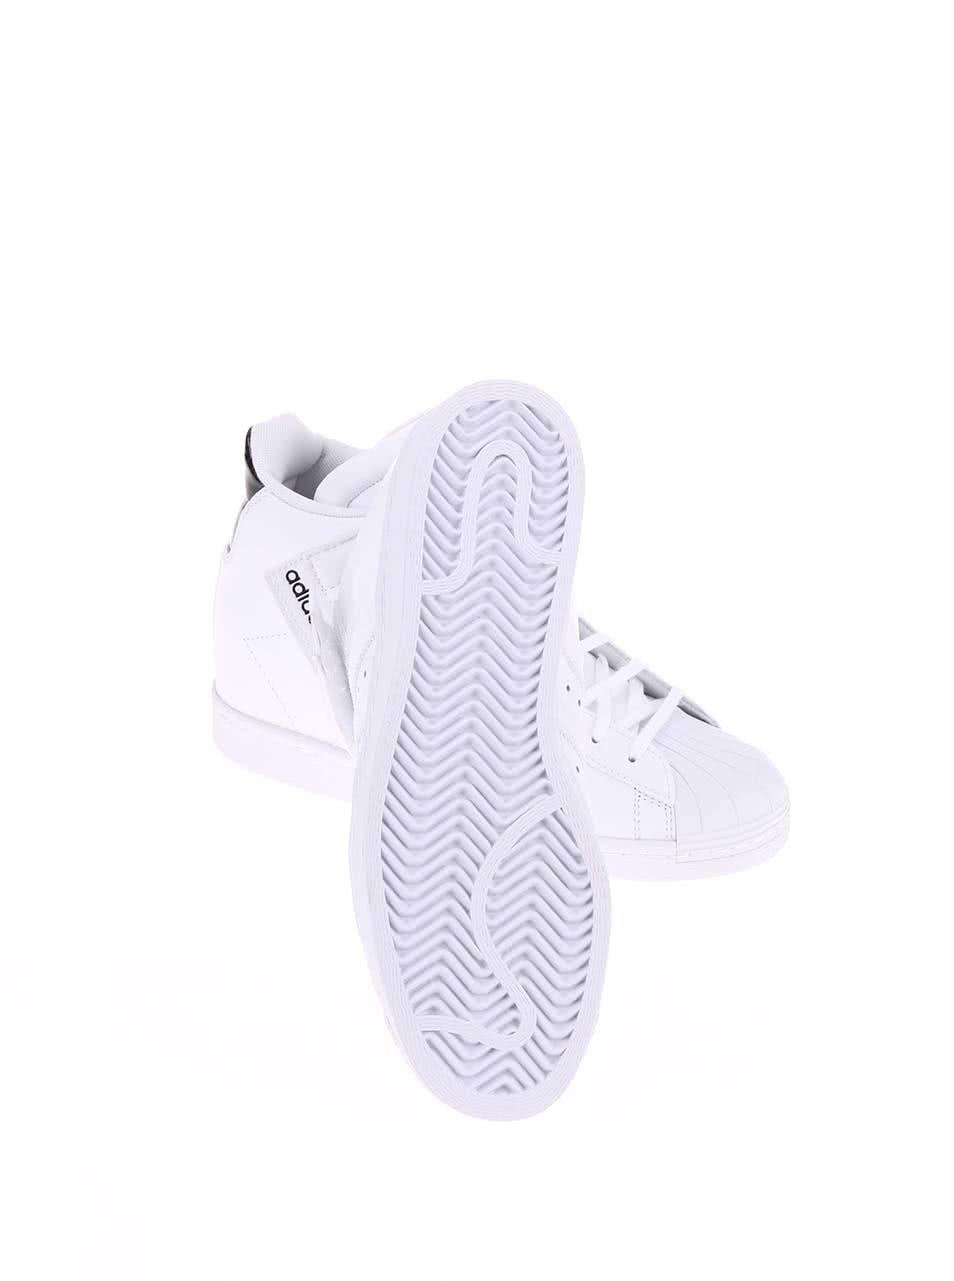 ba0f9f3e5ab4 Biele dámske členkové tenisky adidas Originals Superstar UP Strap ...